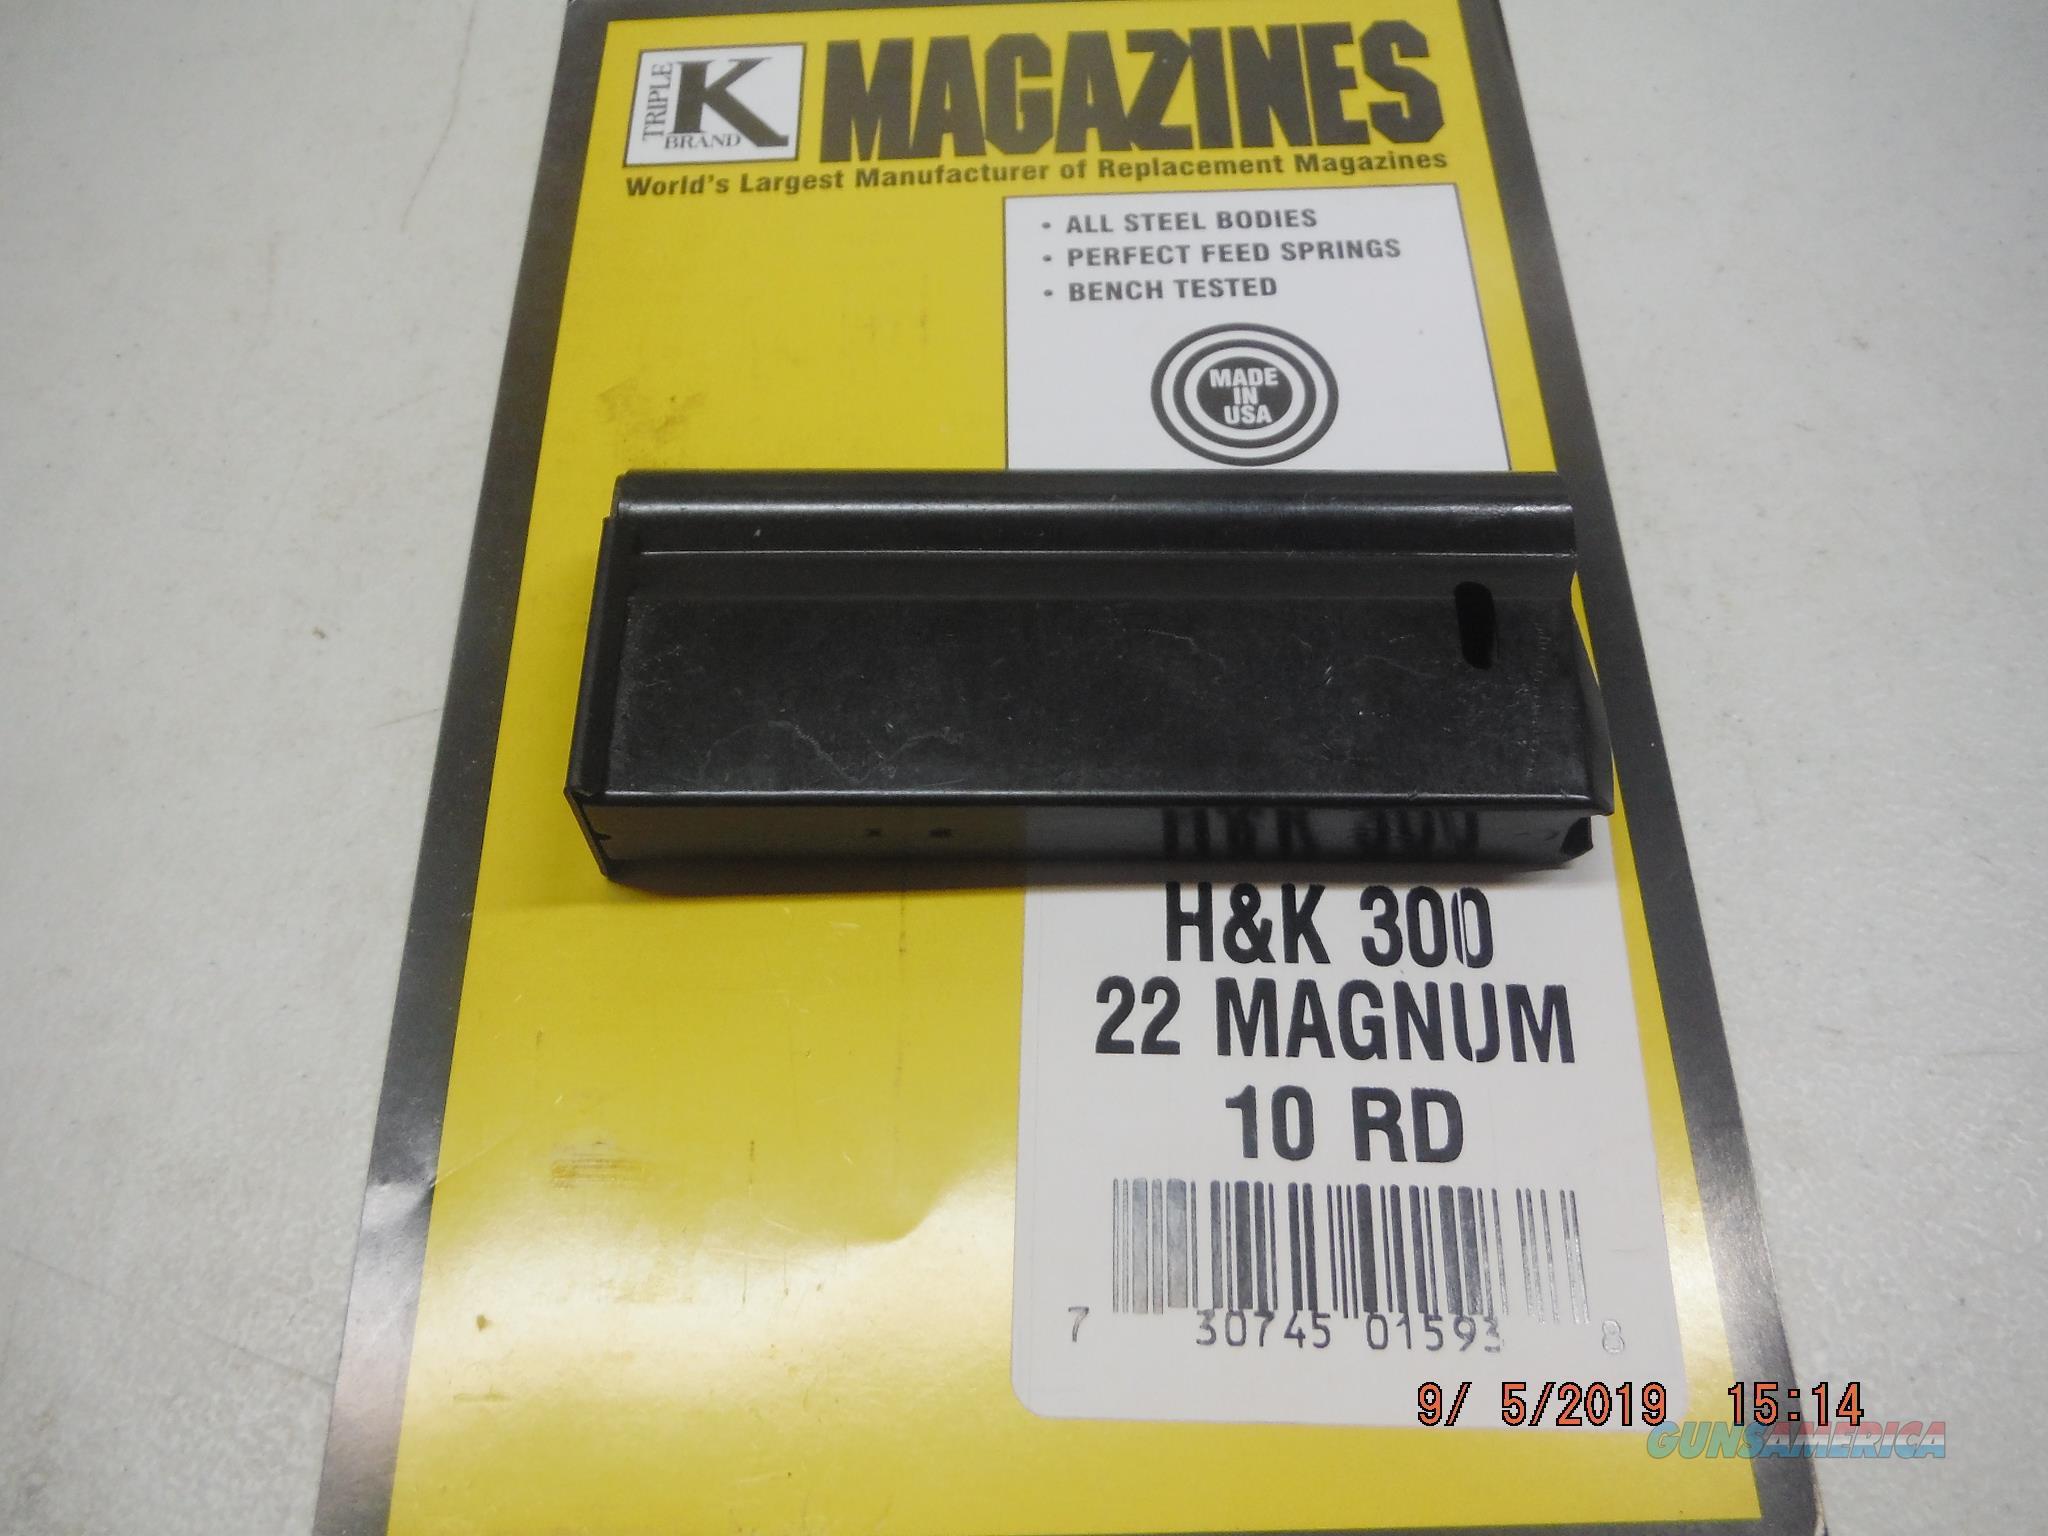 H&K/HK 300 Magazine 22 MAGNUM 10RD HK 300 Mag  Non-Guns > Magazines & Clips > Rifle Magazines > HK/CETME